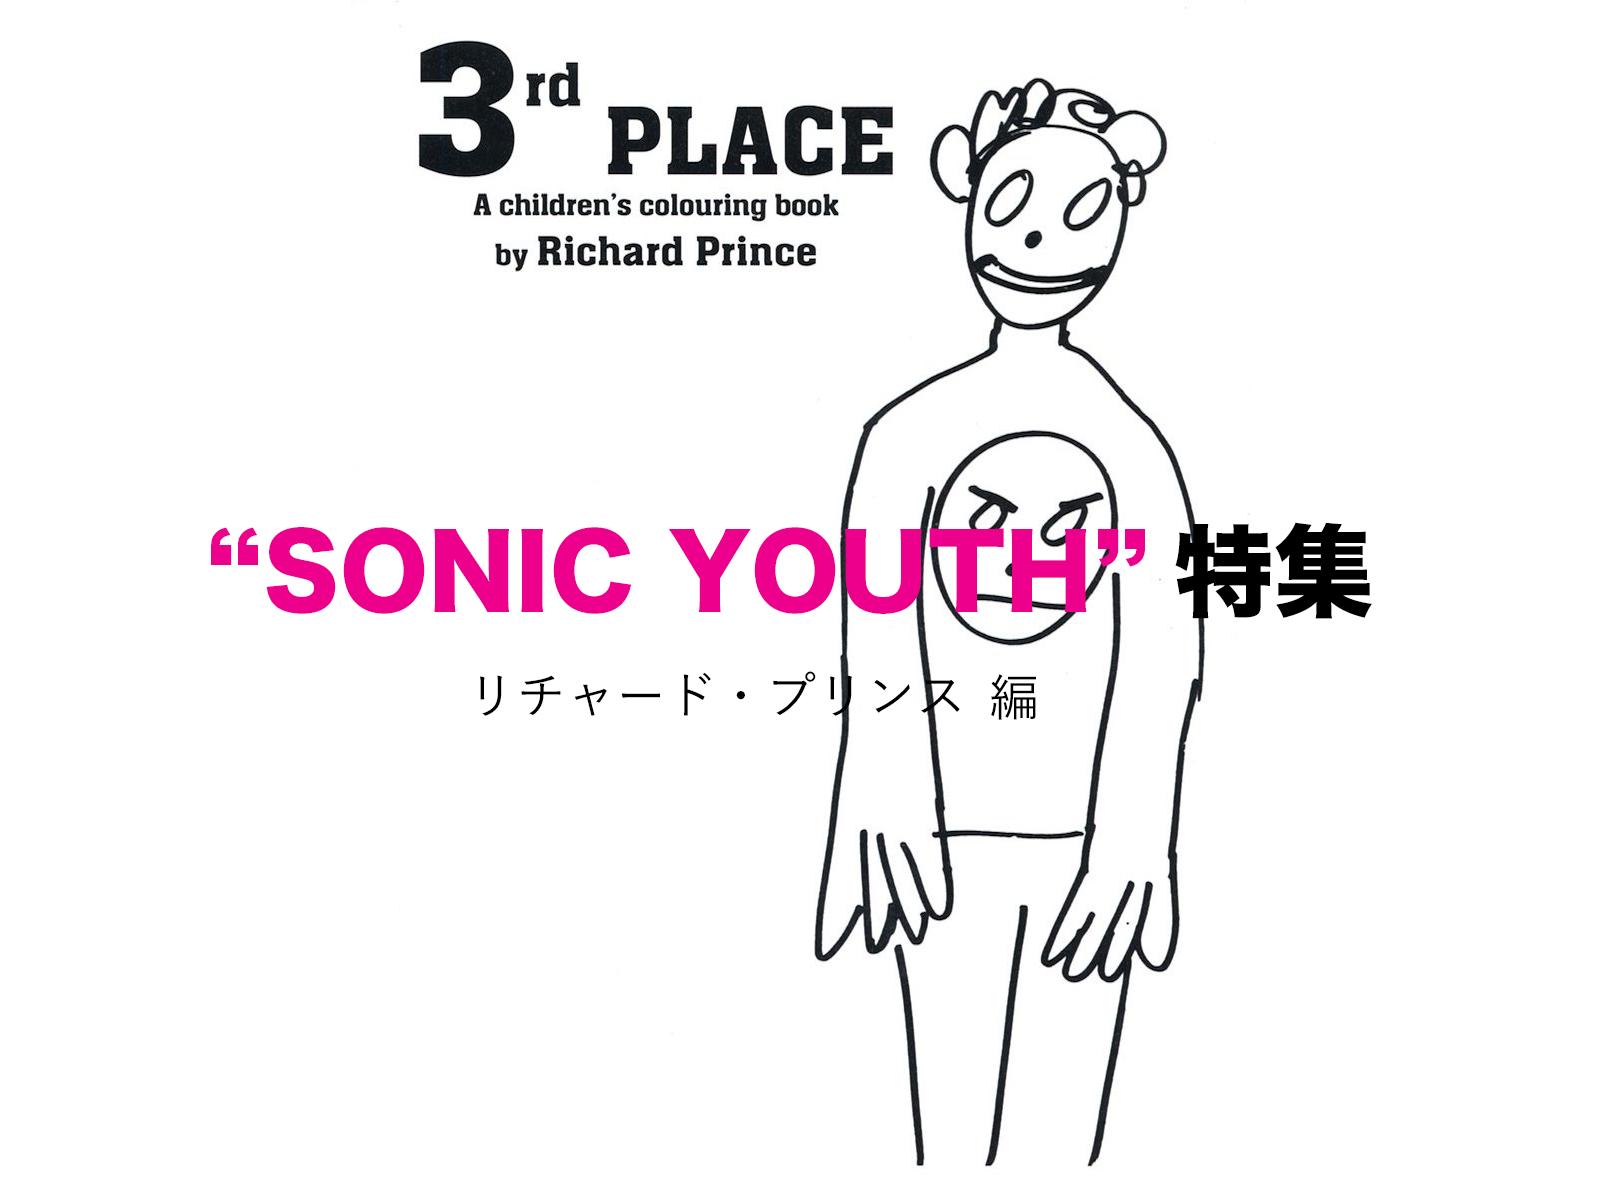 """SONIC YOUTH"" 特集 : RICHARD PRINCE (リチャード・プリンス) 編"